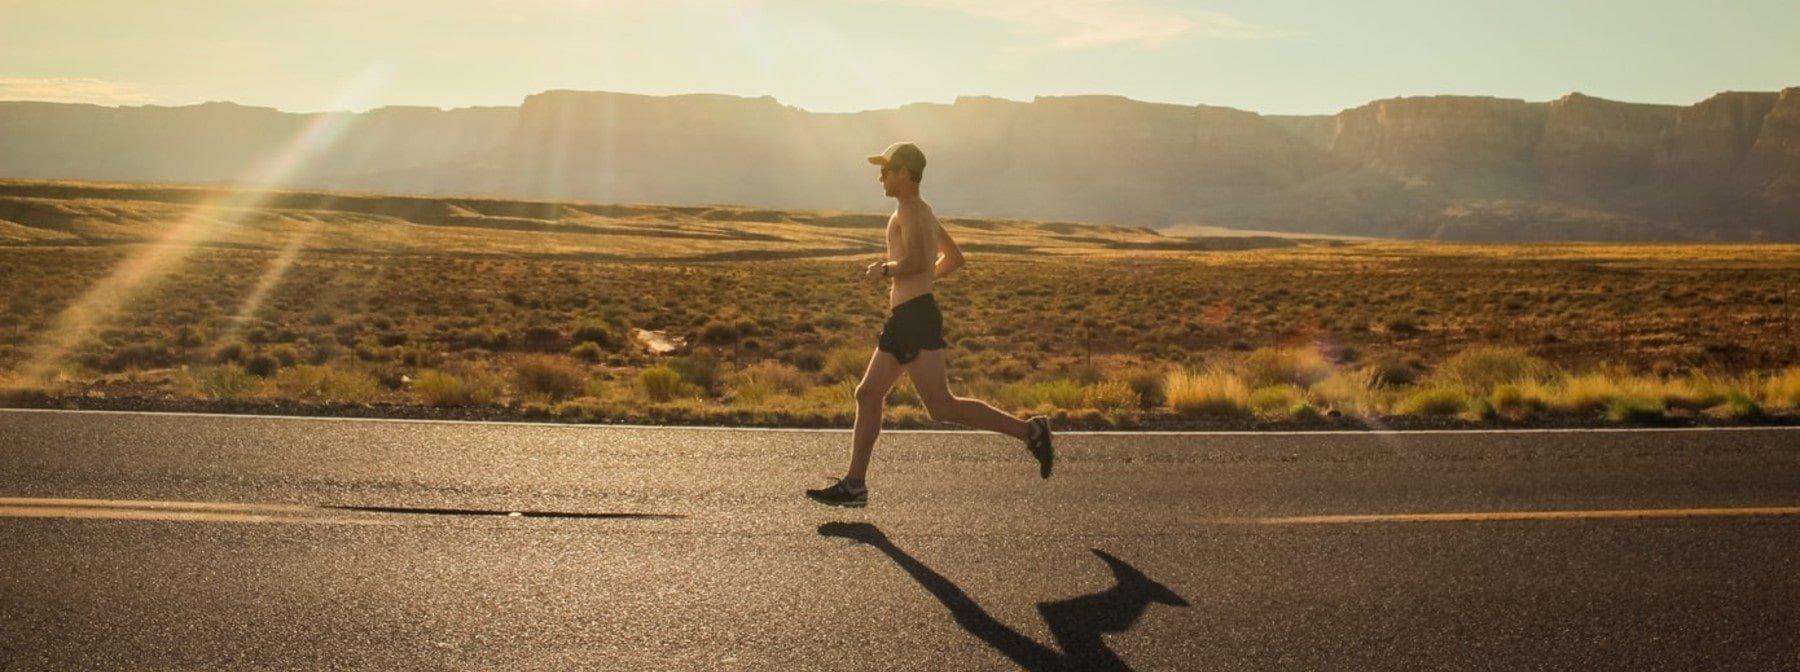 Quick Fat Burn | 10-Minute Treadmill HIIT Workout